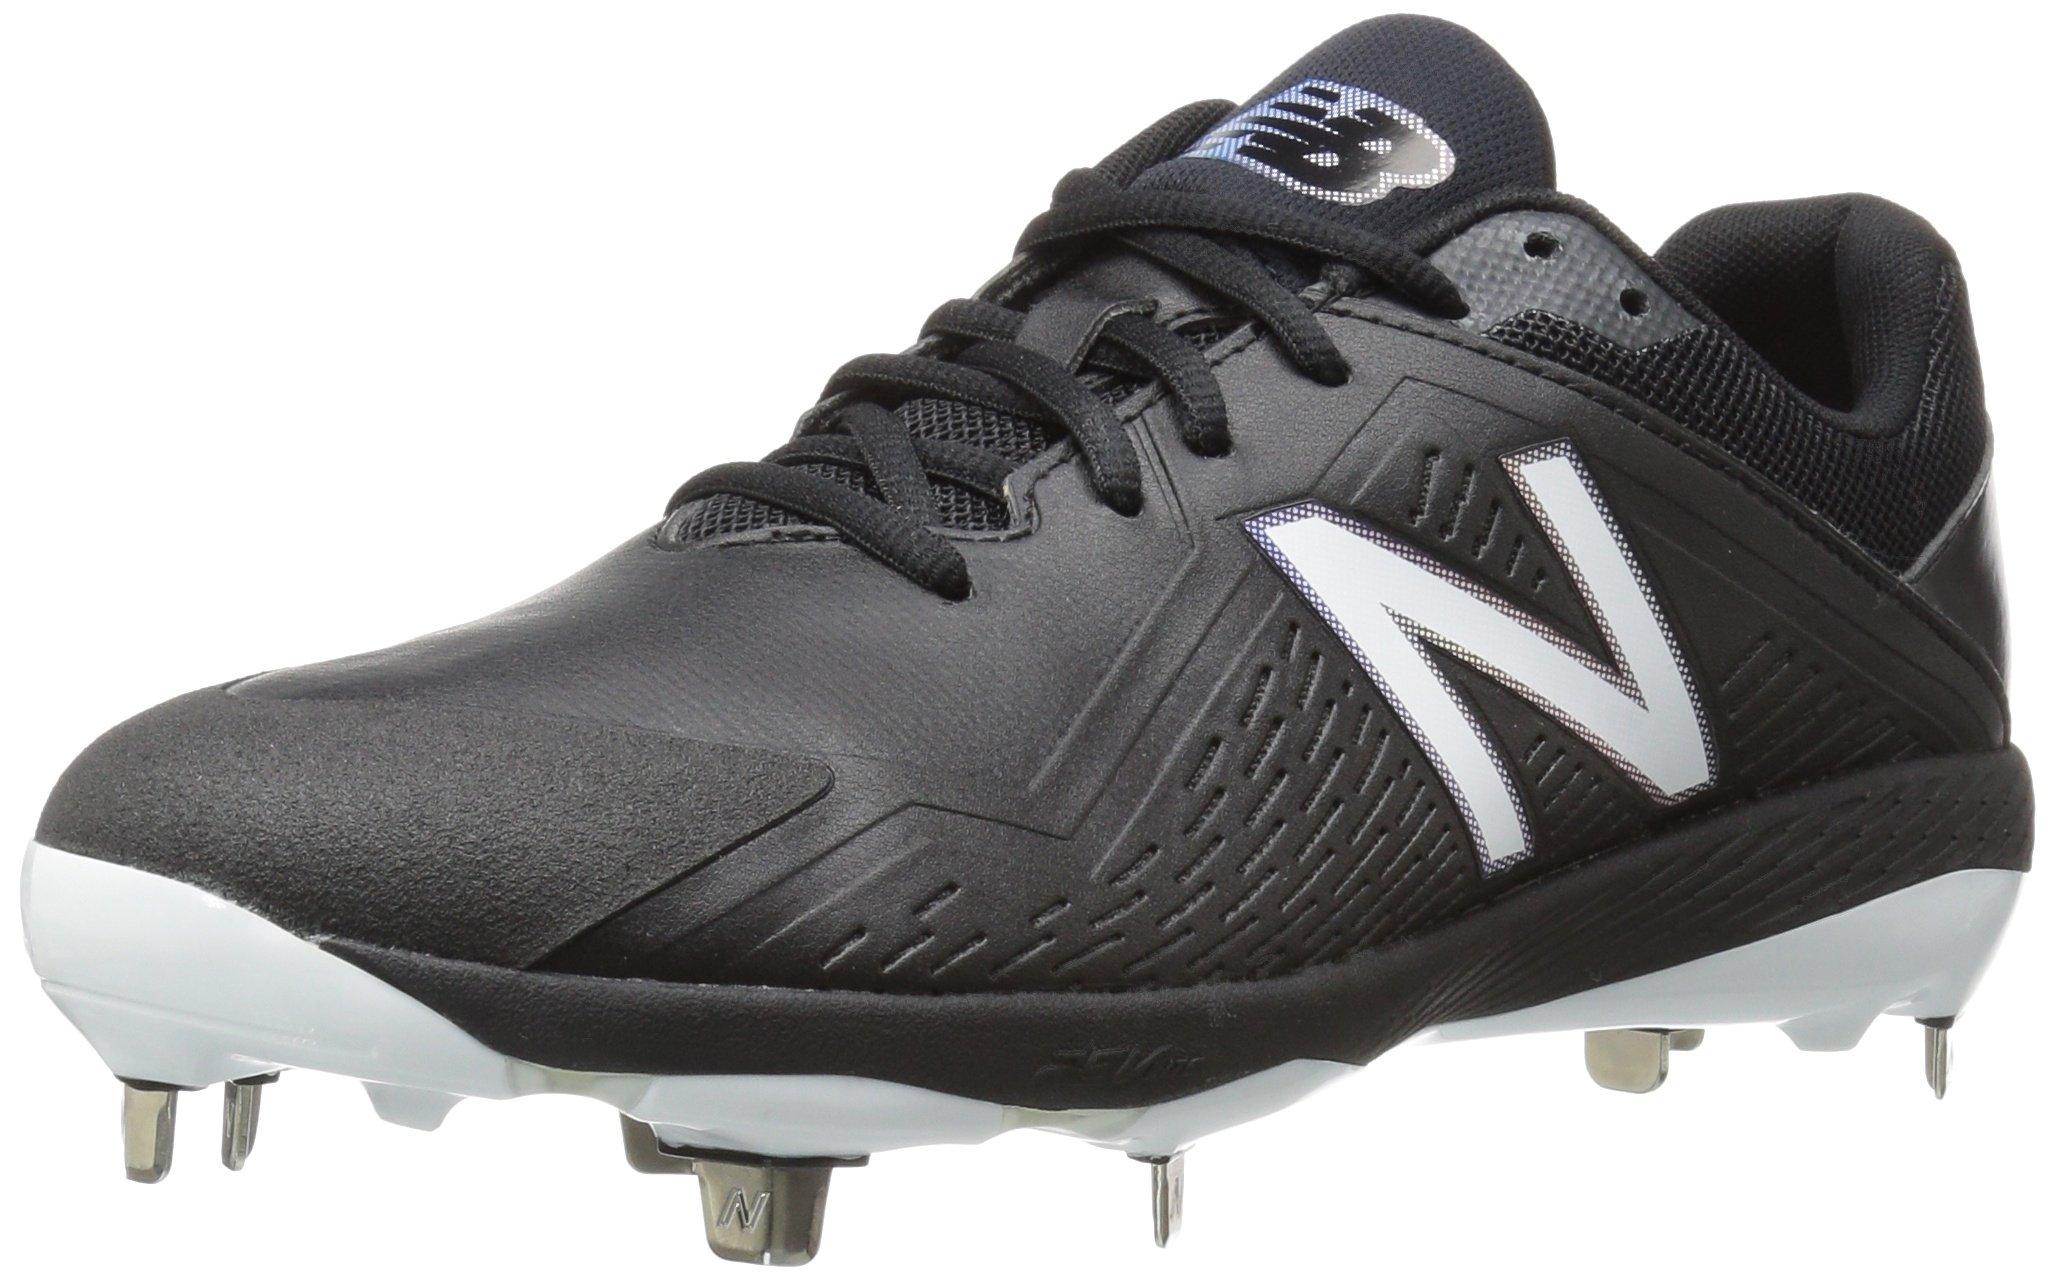 New Balance Women's FUSEV1 Metal Fast Pitch Softball Baseball Shoe, Black/White, 7 D US